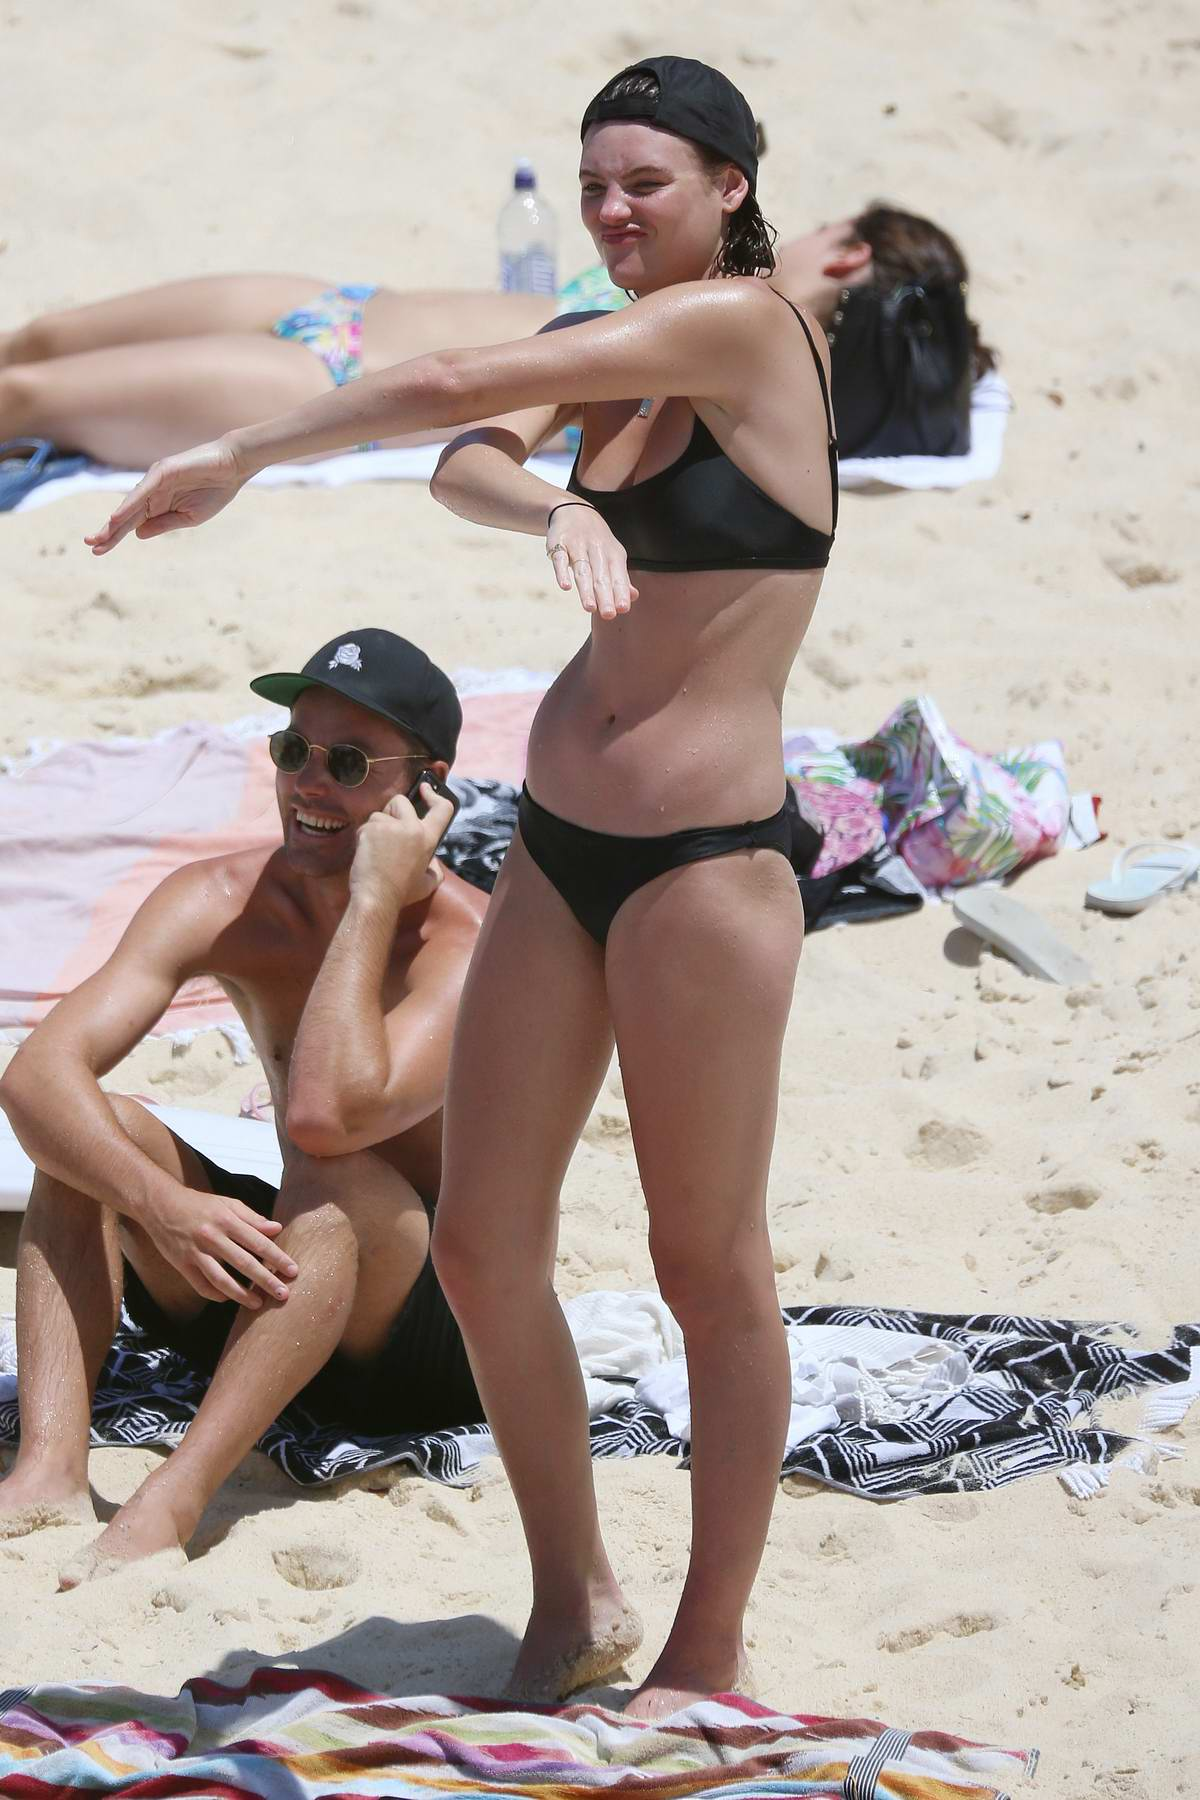 Montana Cox wears a bikini while sunbathing with friends at Tamarama beach in Sydney, Australia